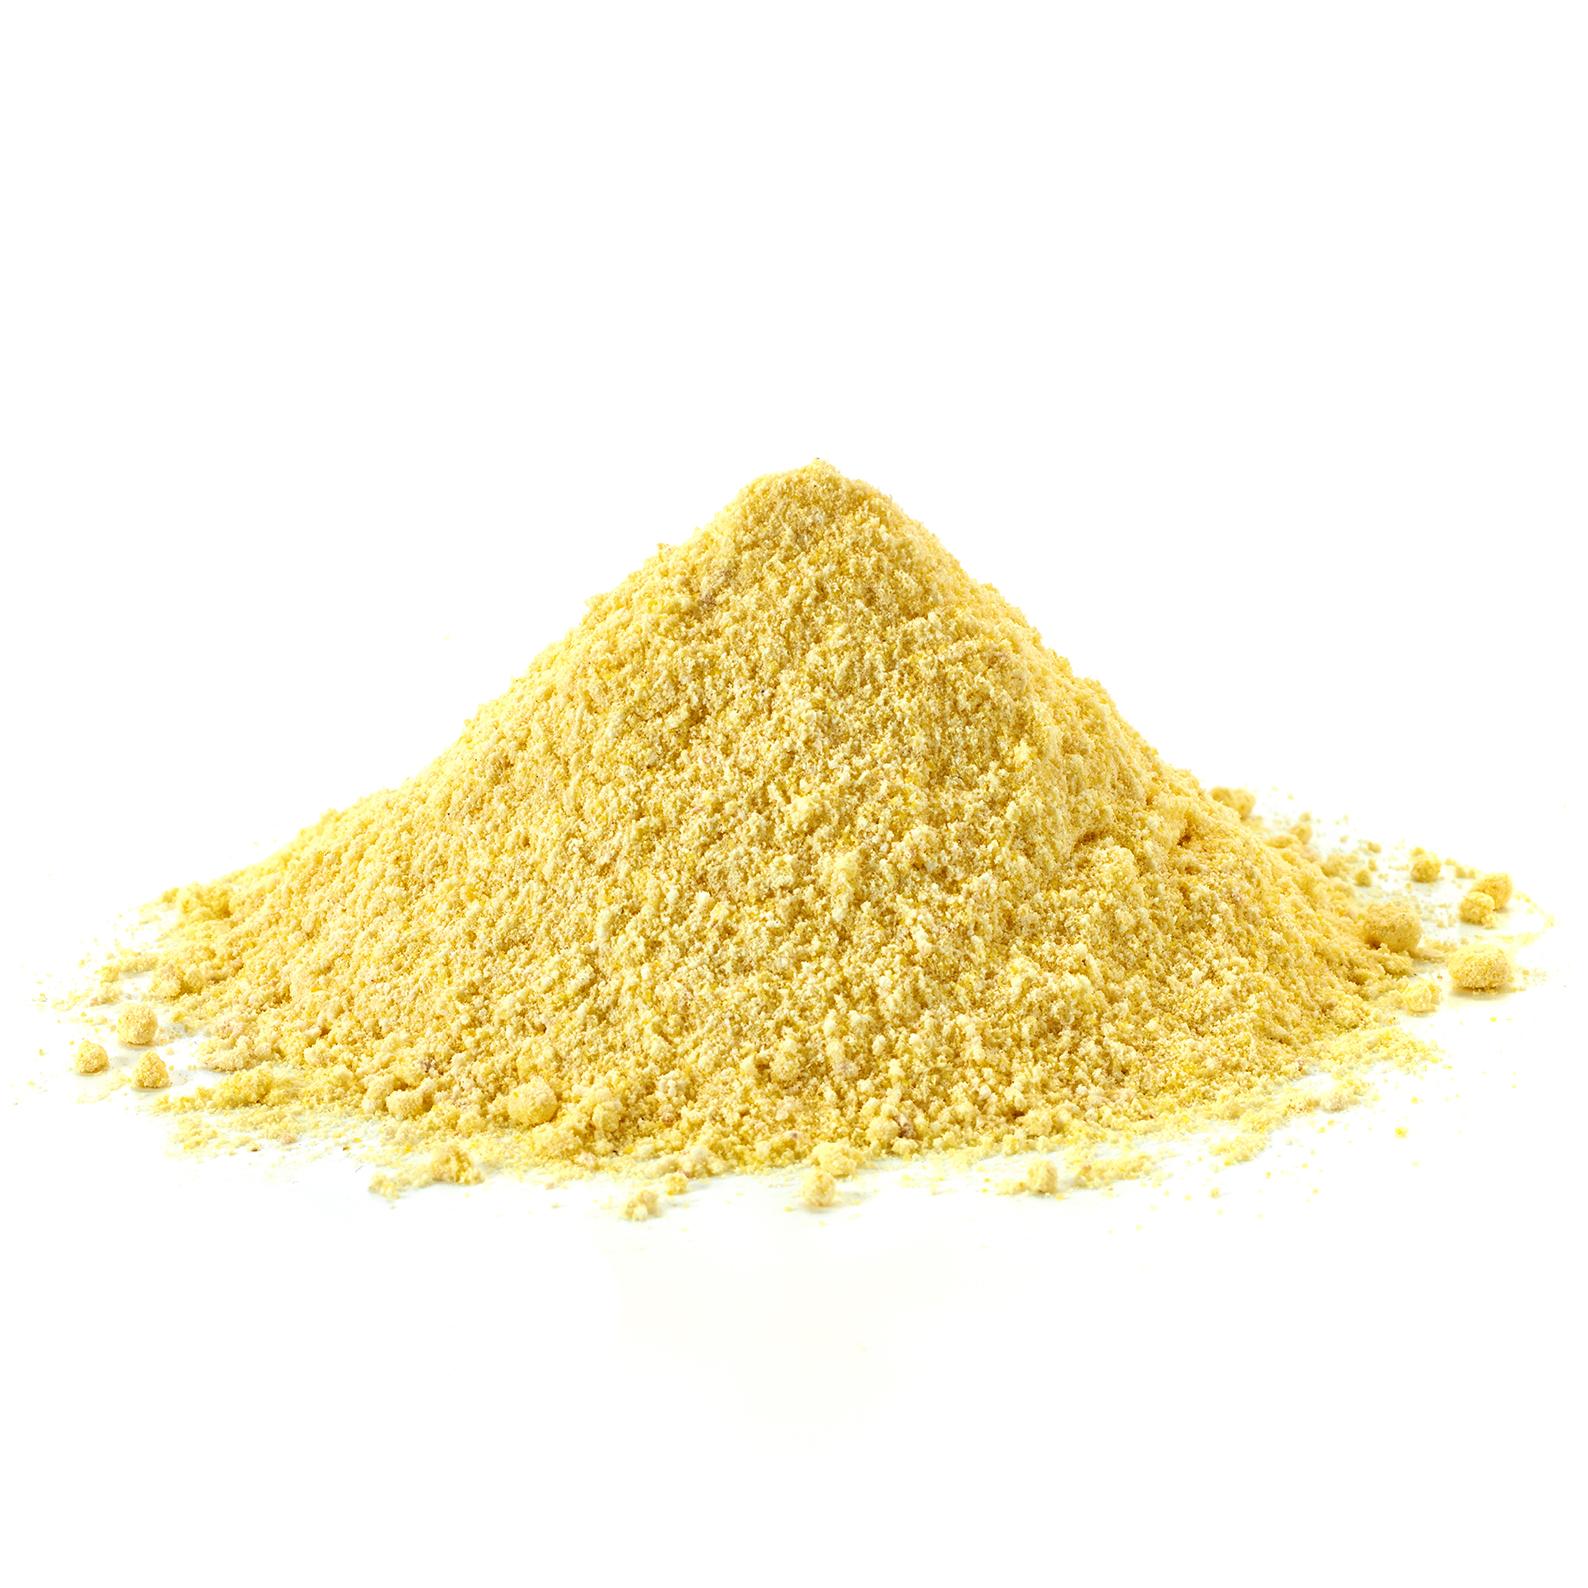 Gram Flour - Besan